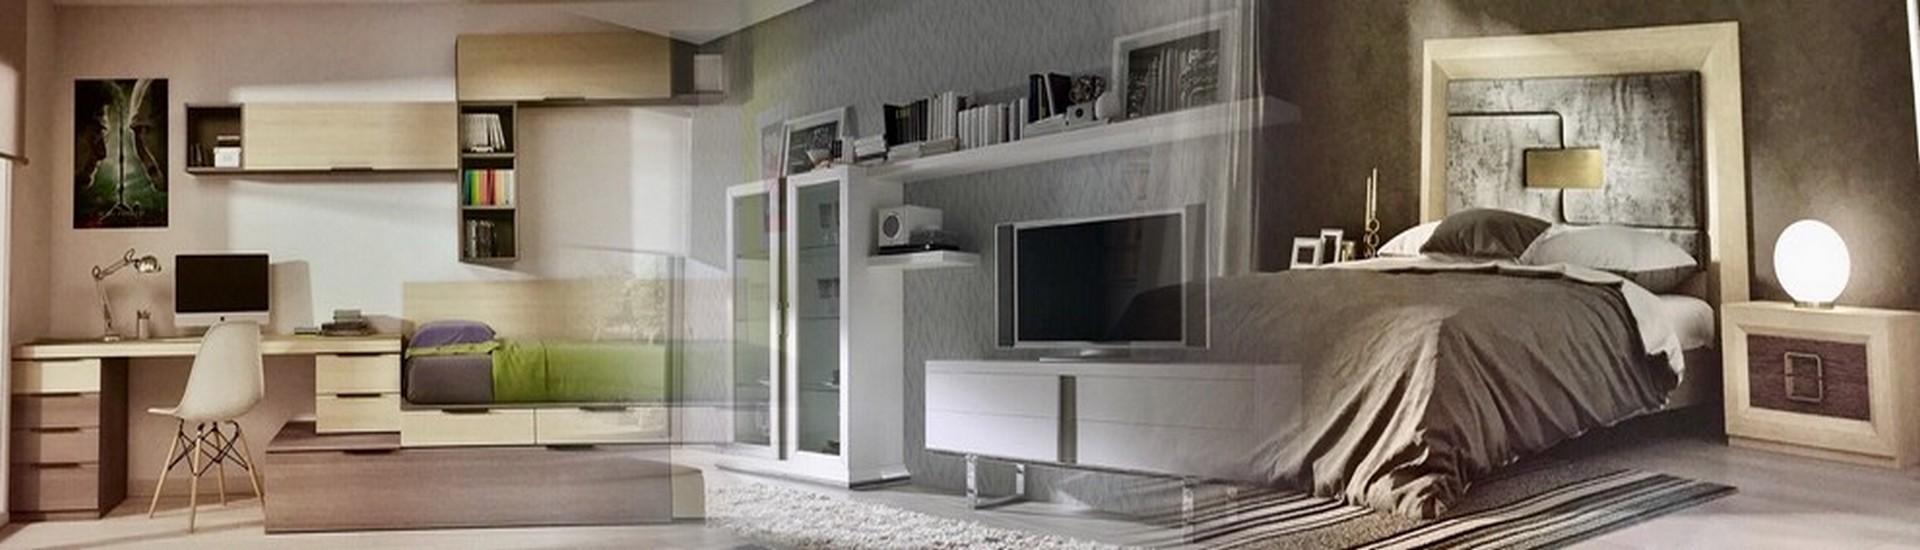 muebles bravo, muebles bravo palencia